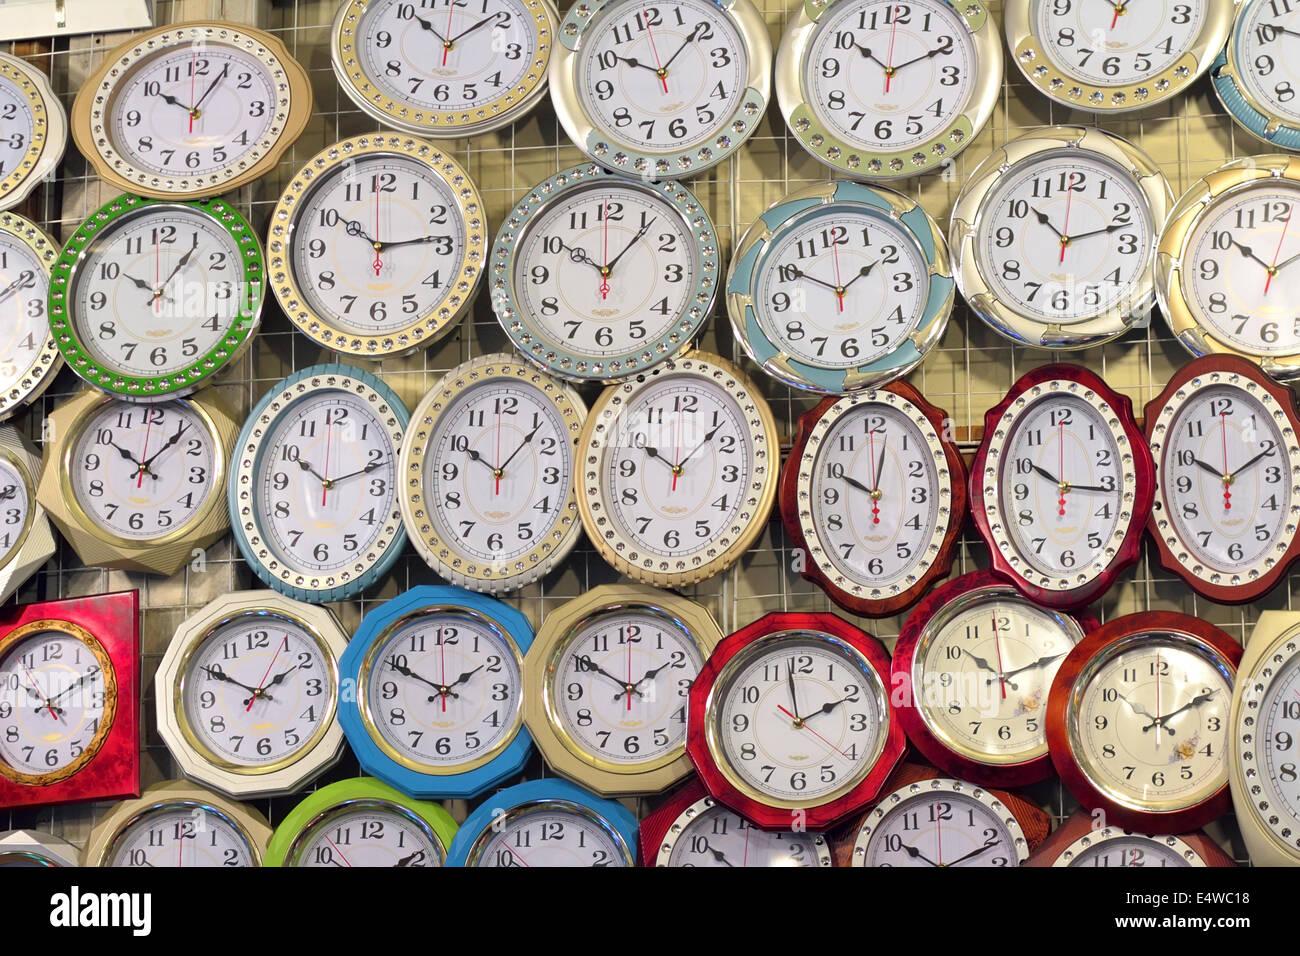 Wall Clocks - Stock Image